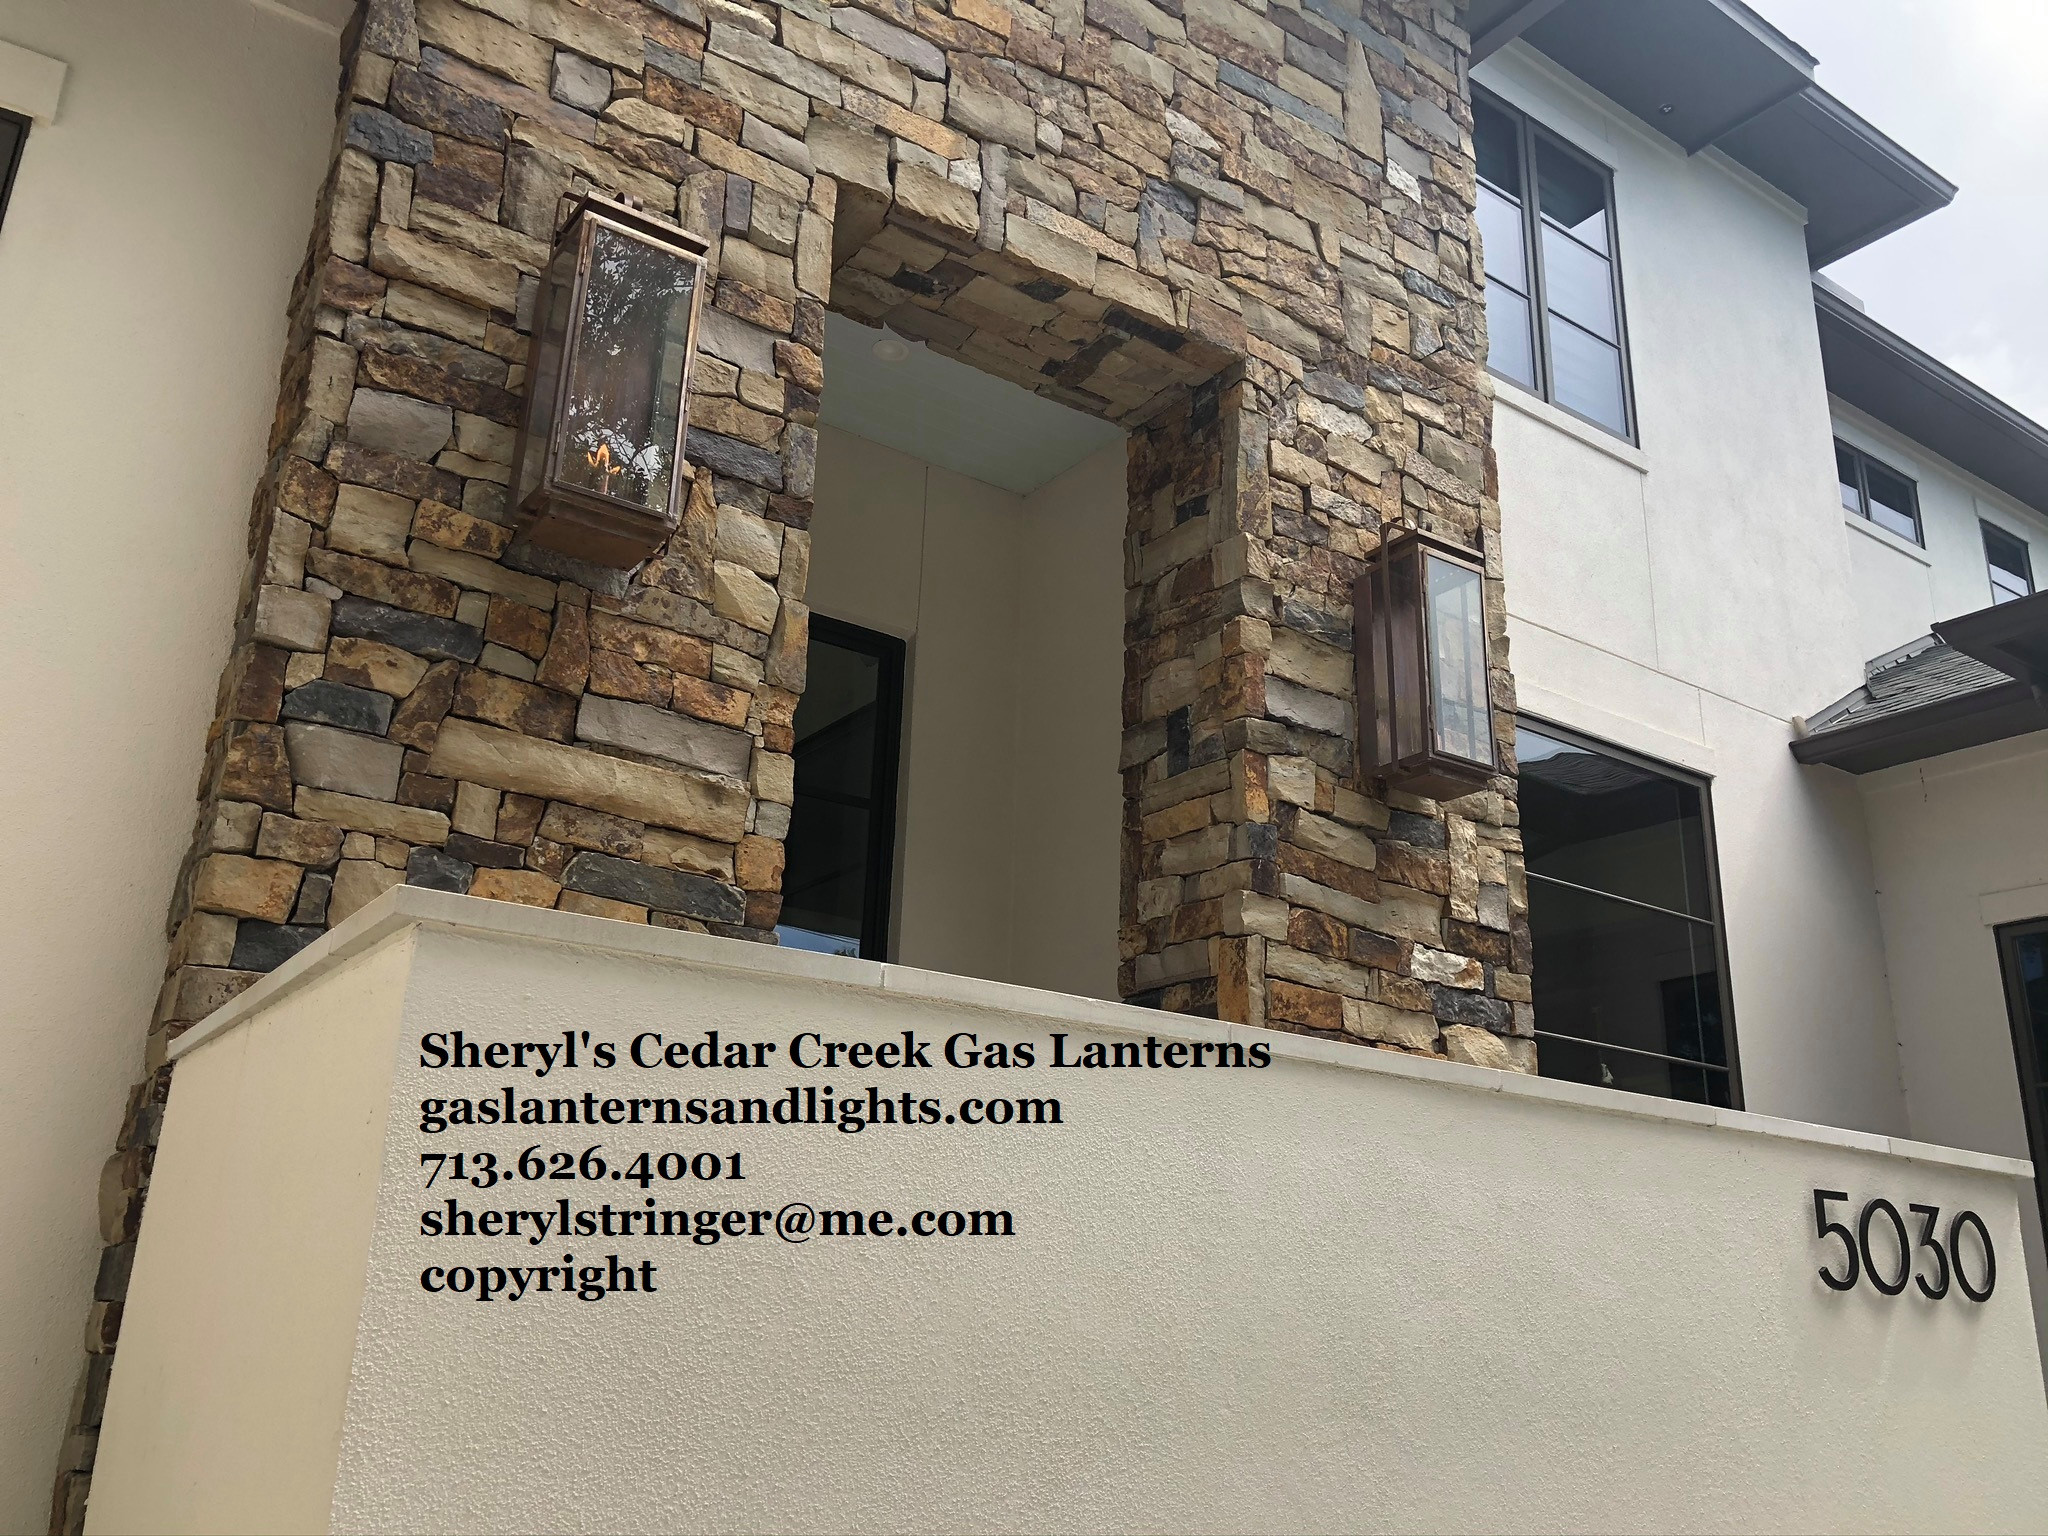 Sheryl's Cedar Creek Transitional Gas Lantern